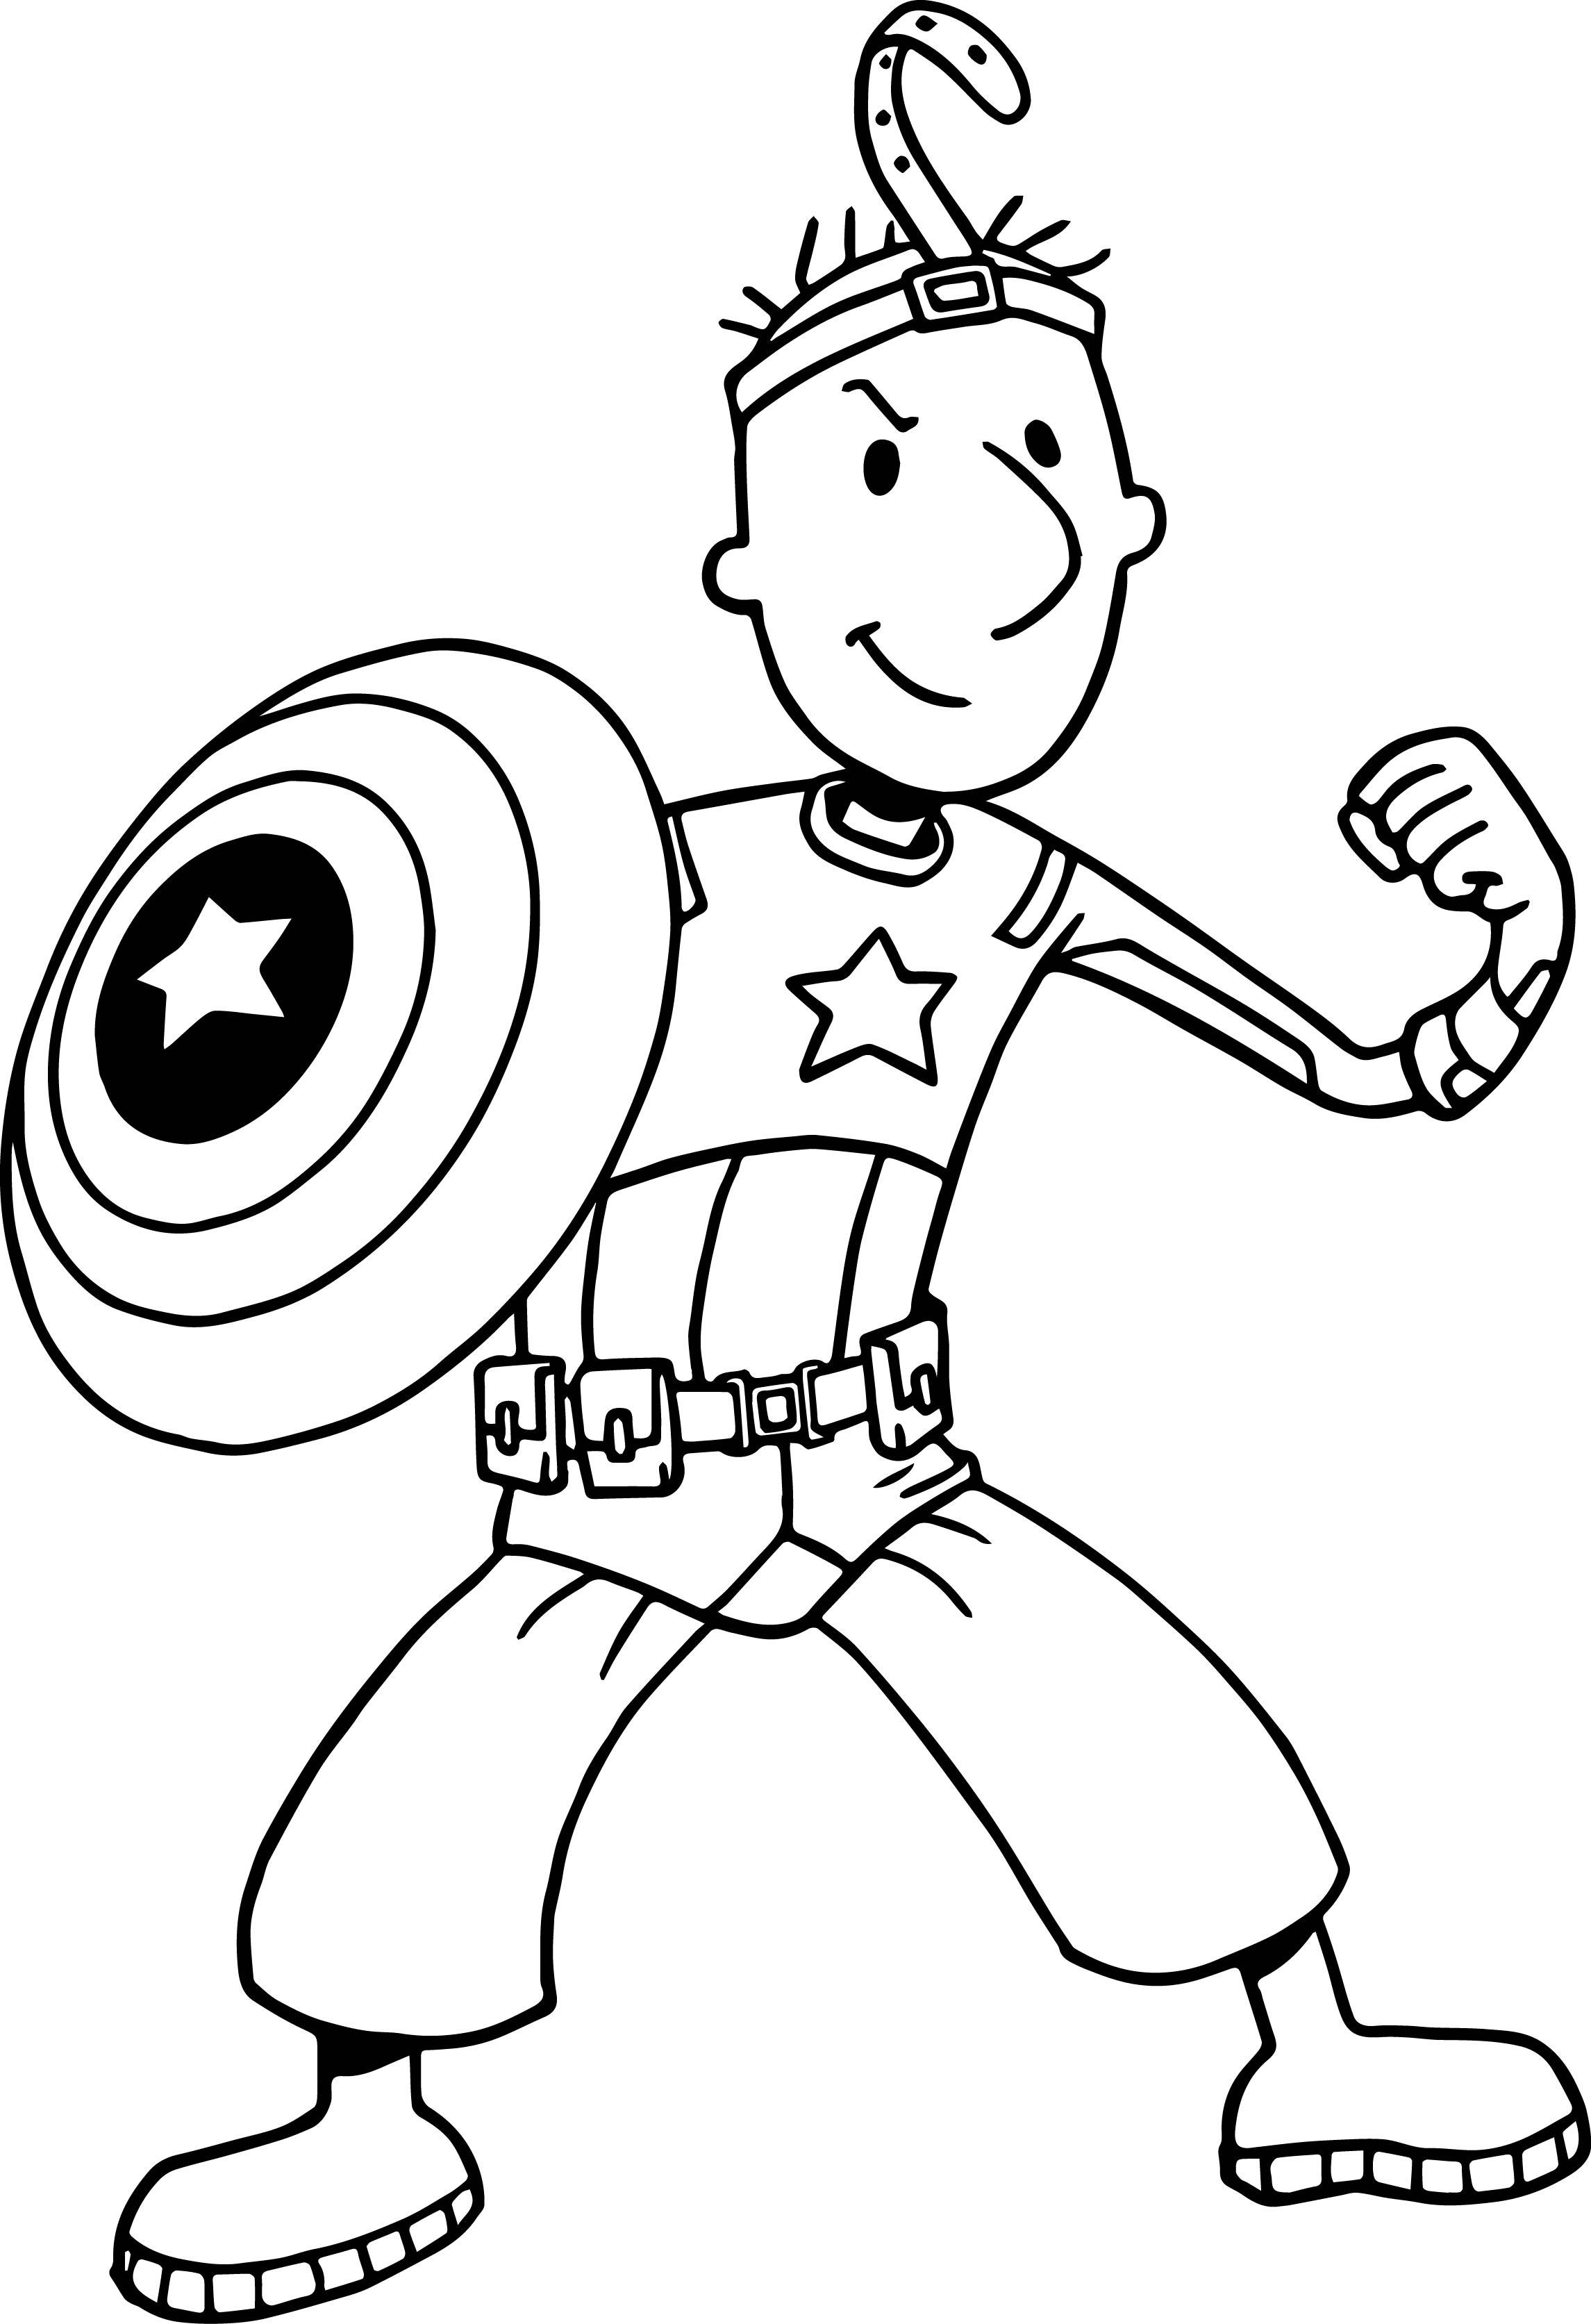 nickelodeon avengers doug coloring page wecoloringpage